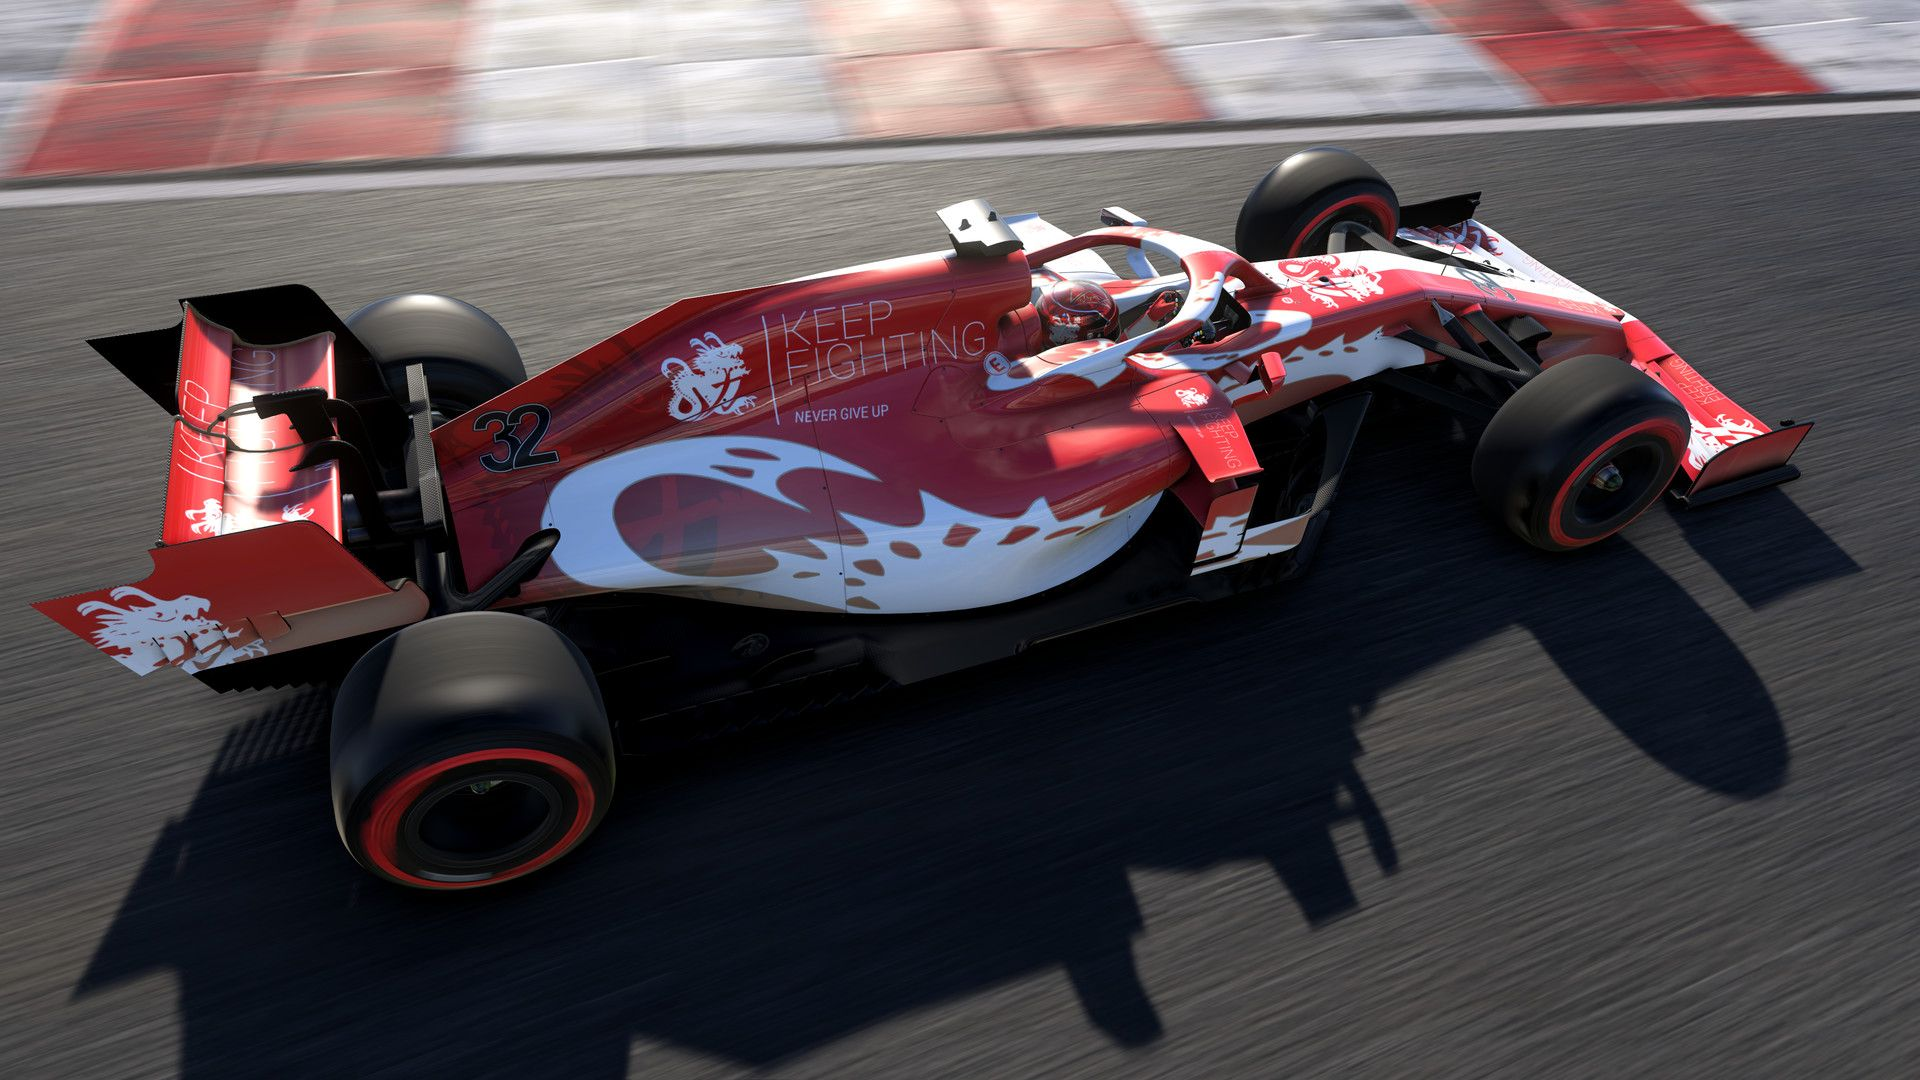 F12020KEEPFIGHTING3.jpg